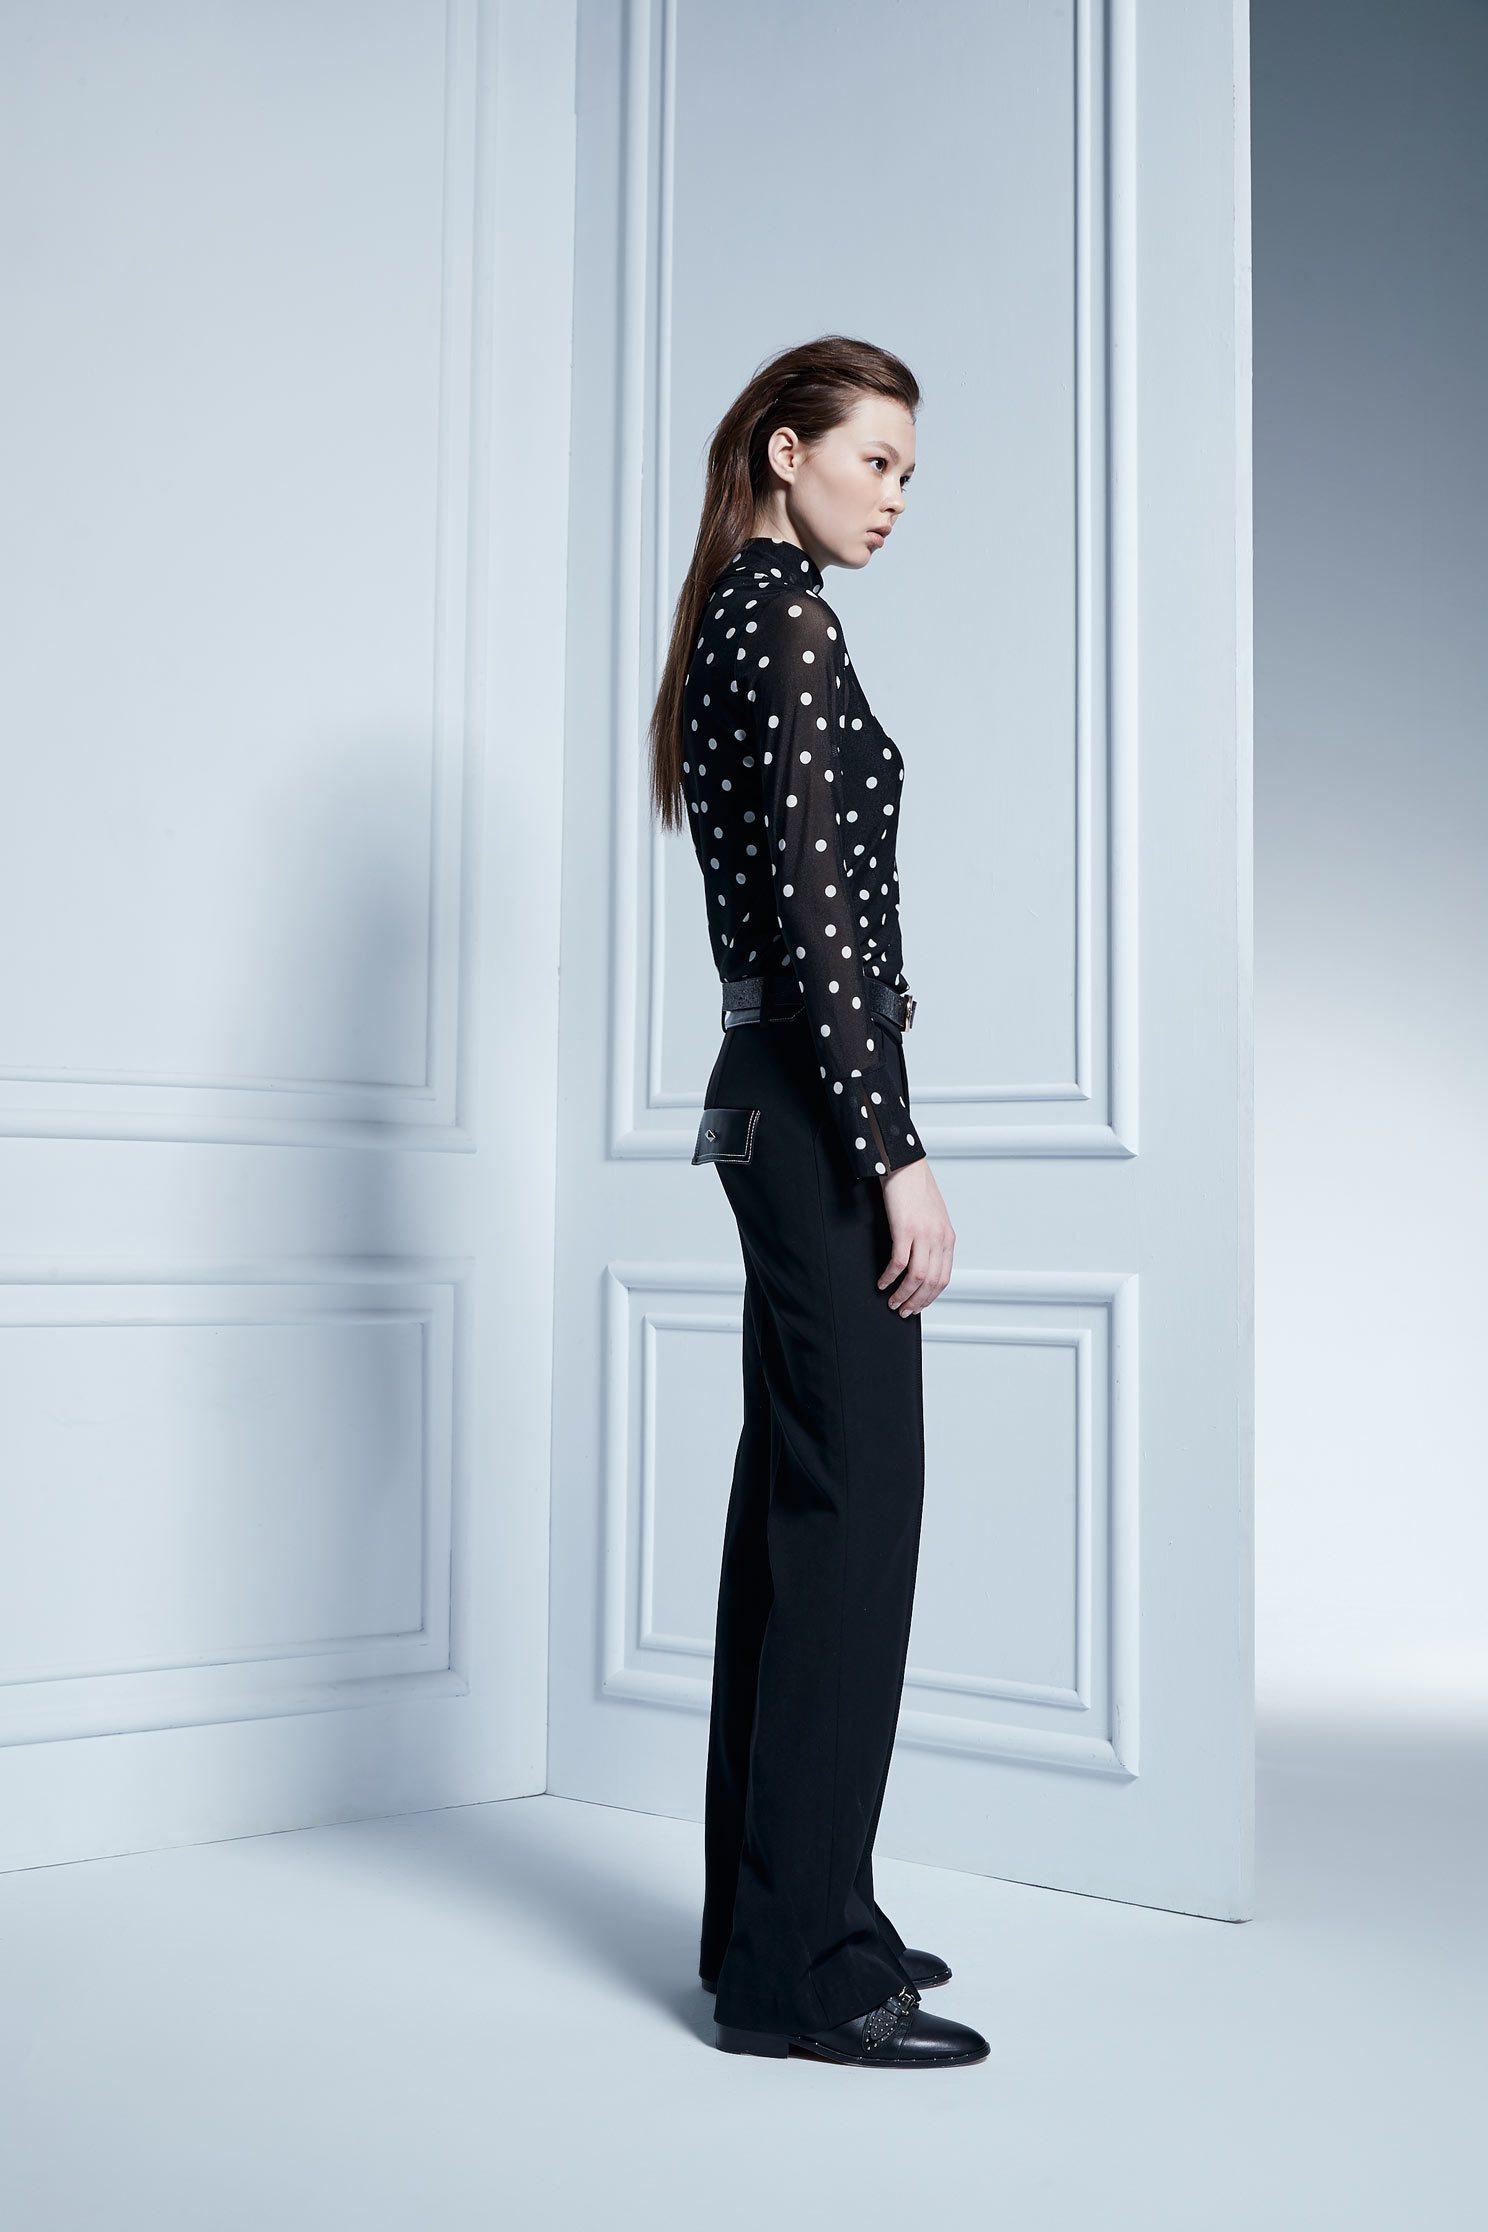 Large polka dot high-necked long-sleeved top,Top,透膚上衣,長袖上衣,Turtleneck top,黑色上衣